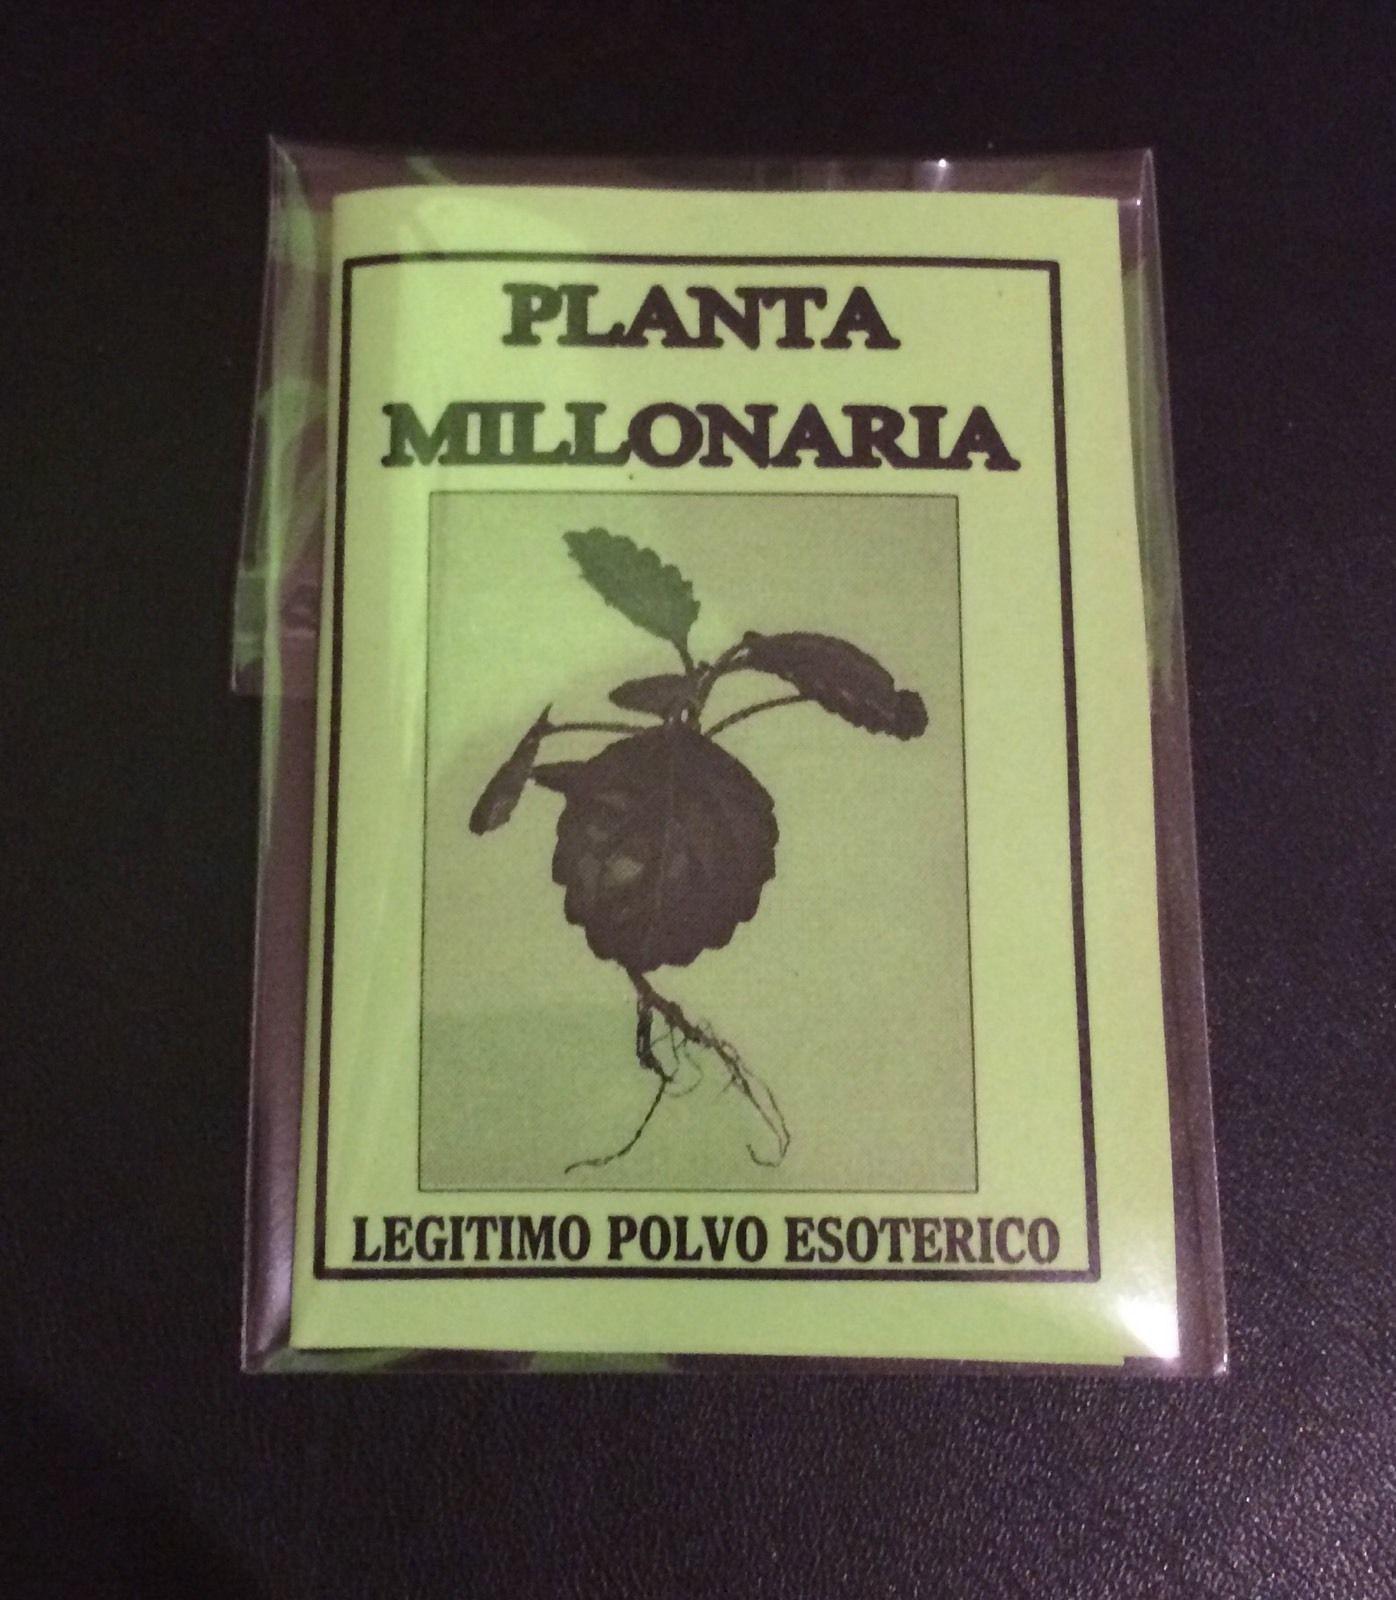 LEGITIMO POLVO ESOTERICO PLANTA MILLONARIA